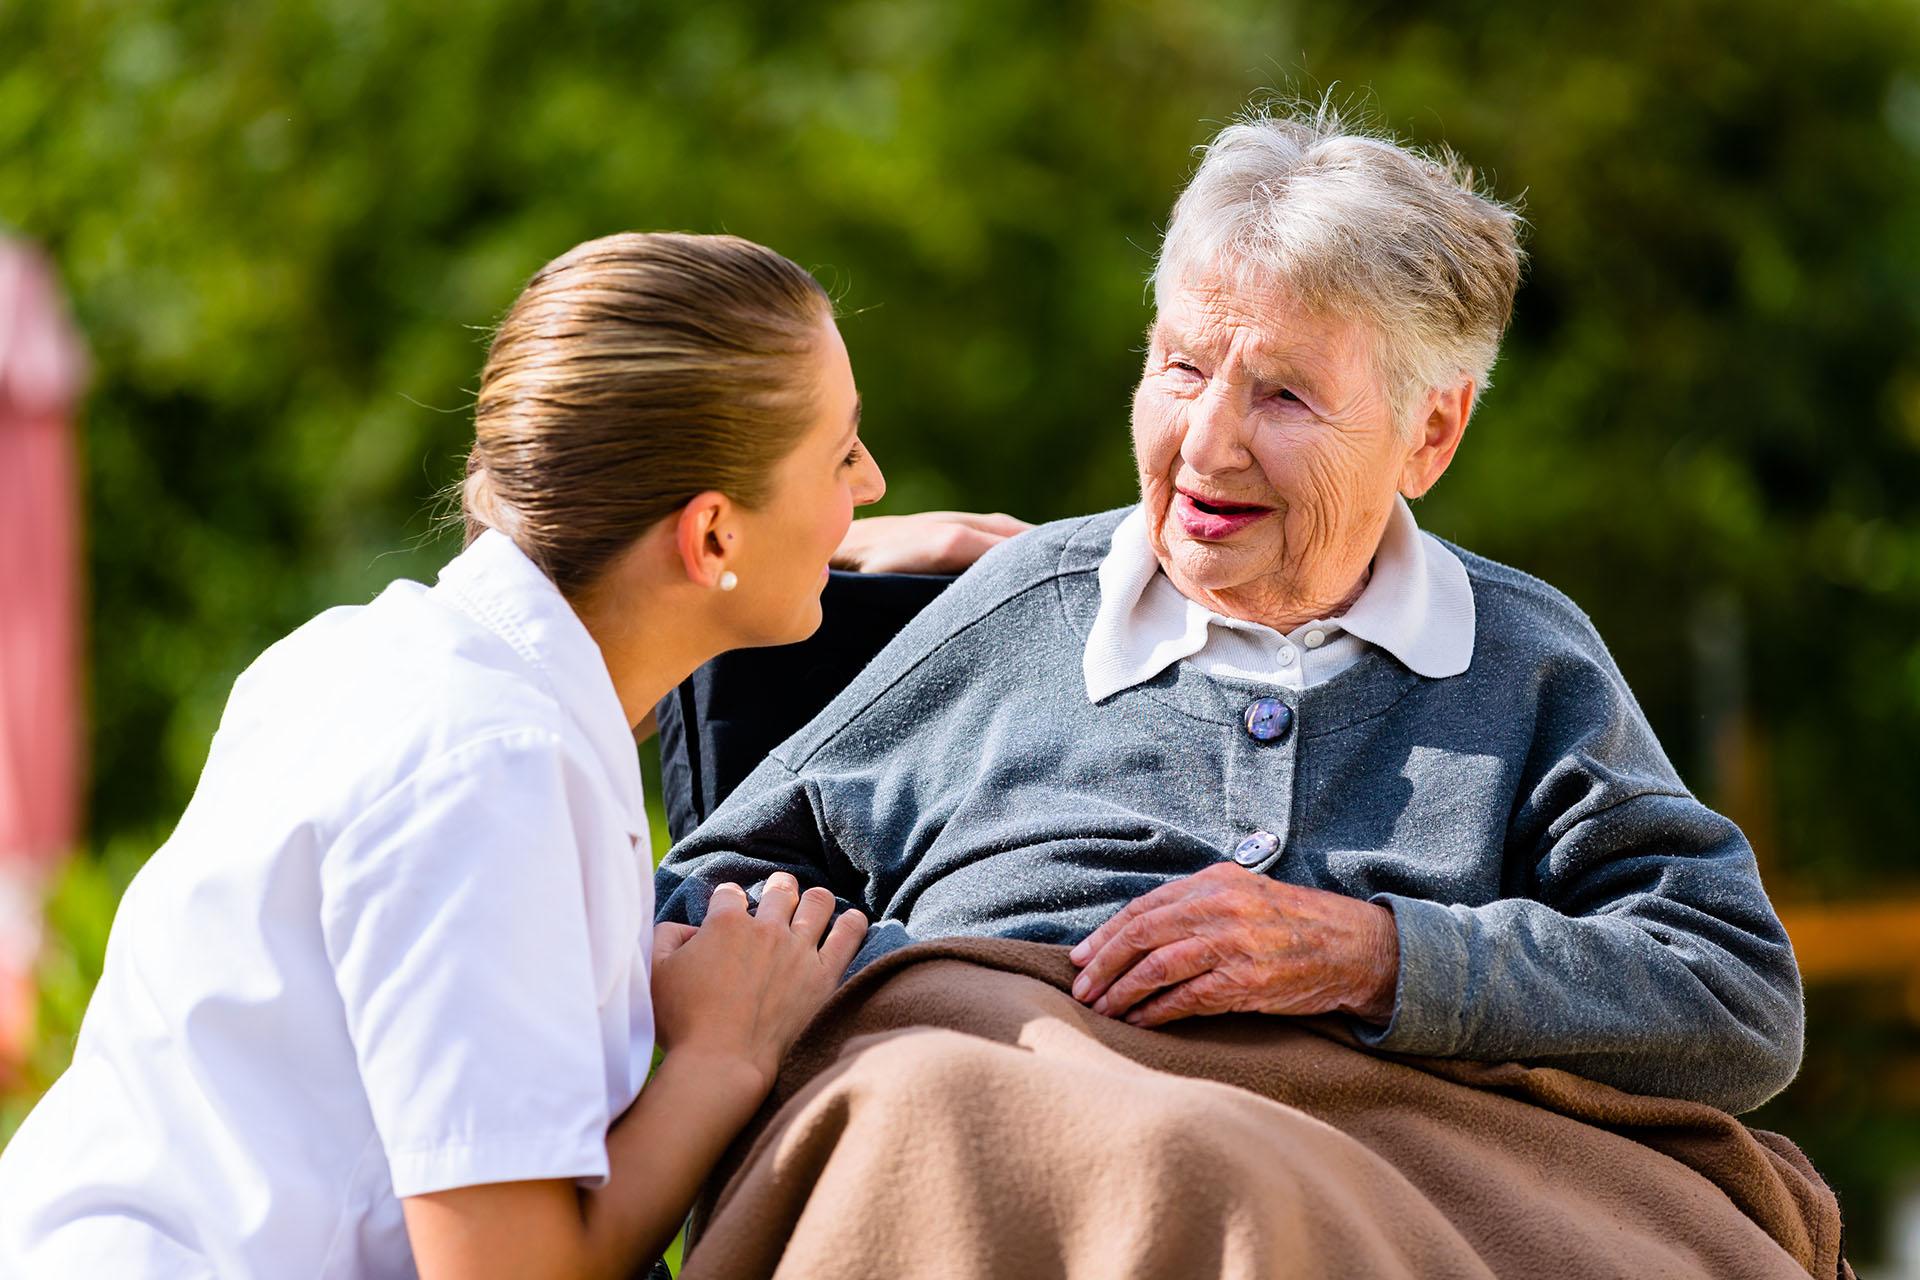 When Should You Employ a Caregiver?